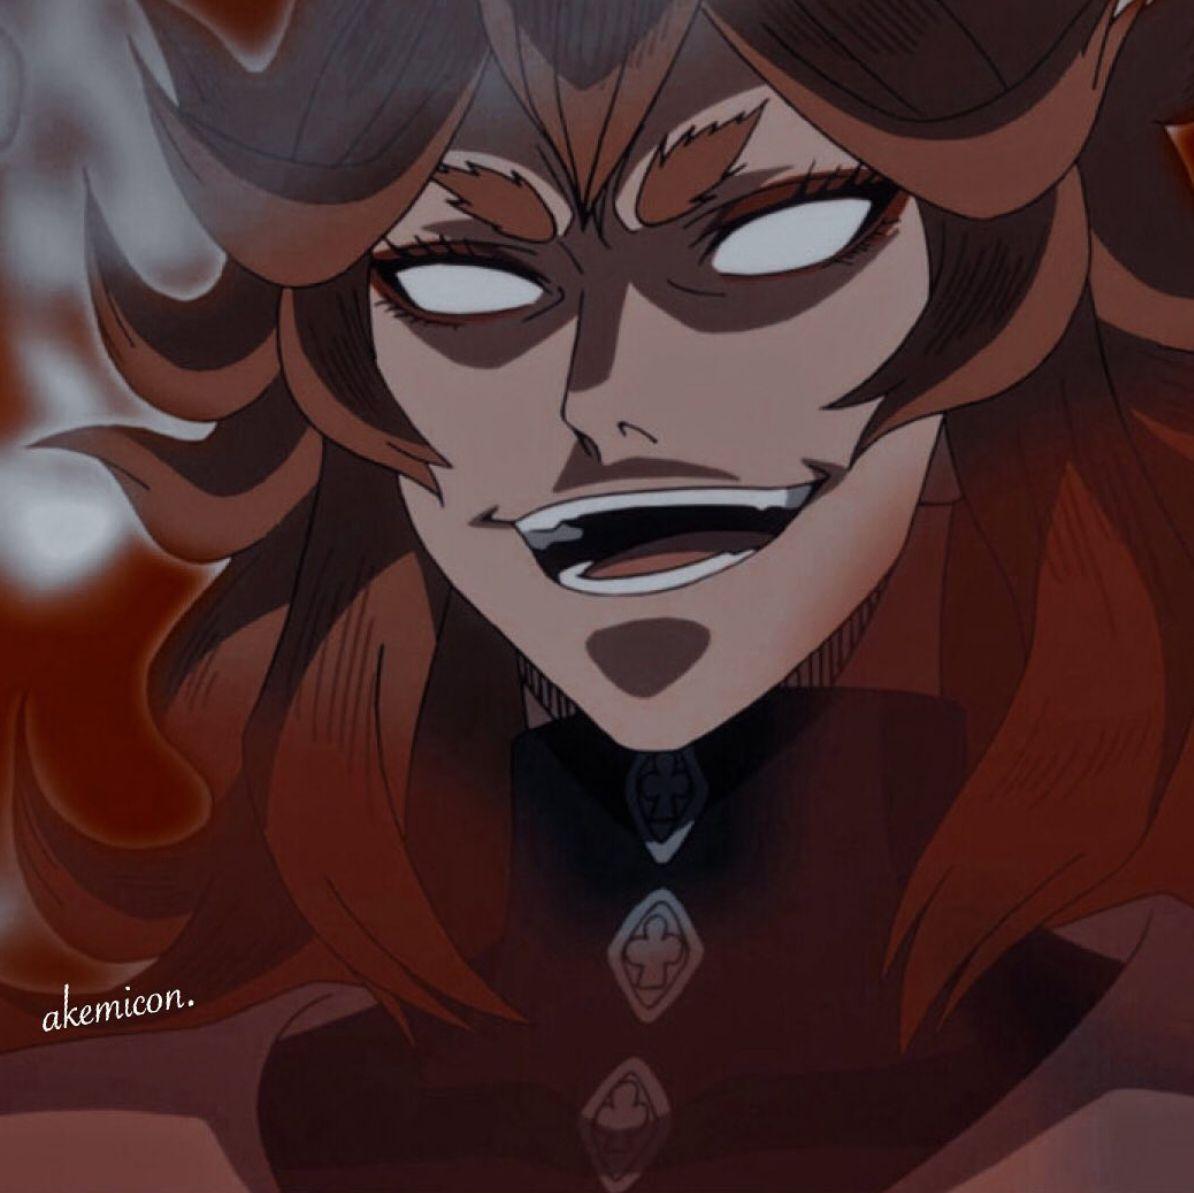 Mereoleona Icons Black Clover Anime Black Clover Manga Anime